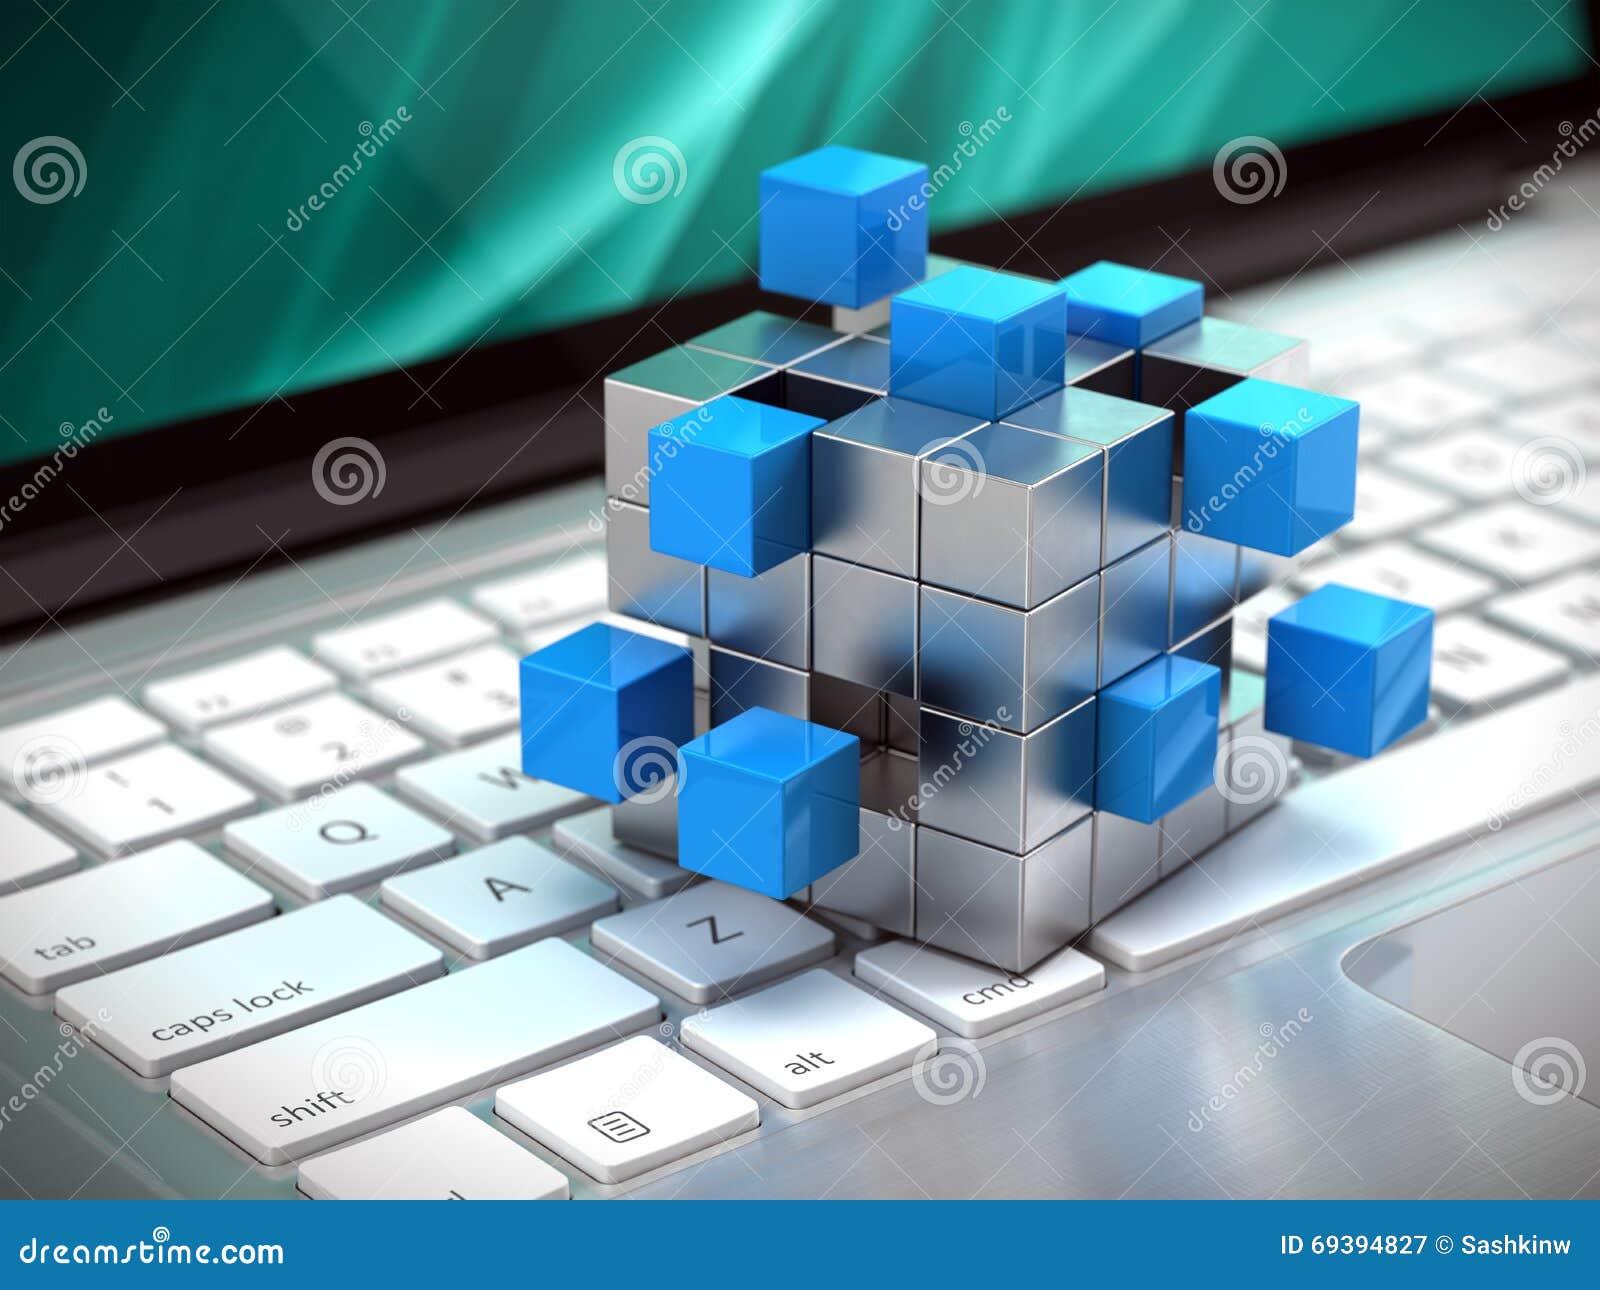 Teamwork Business Concept Cube Assembling From Blocks On Laptop